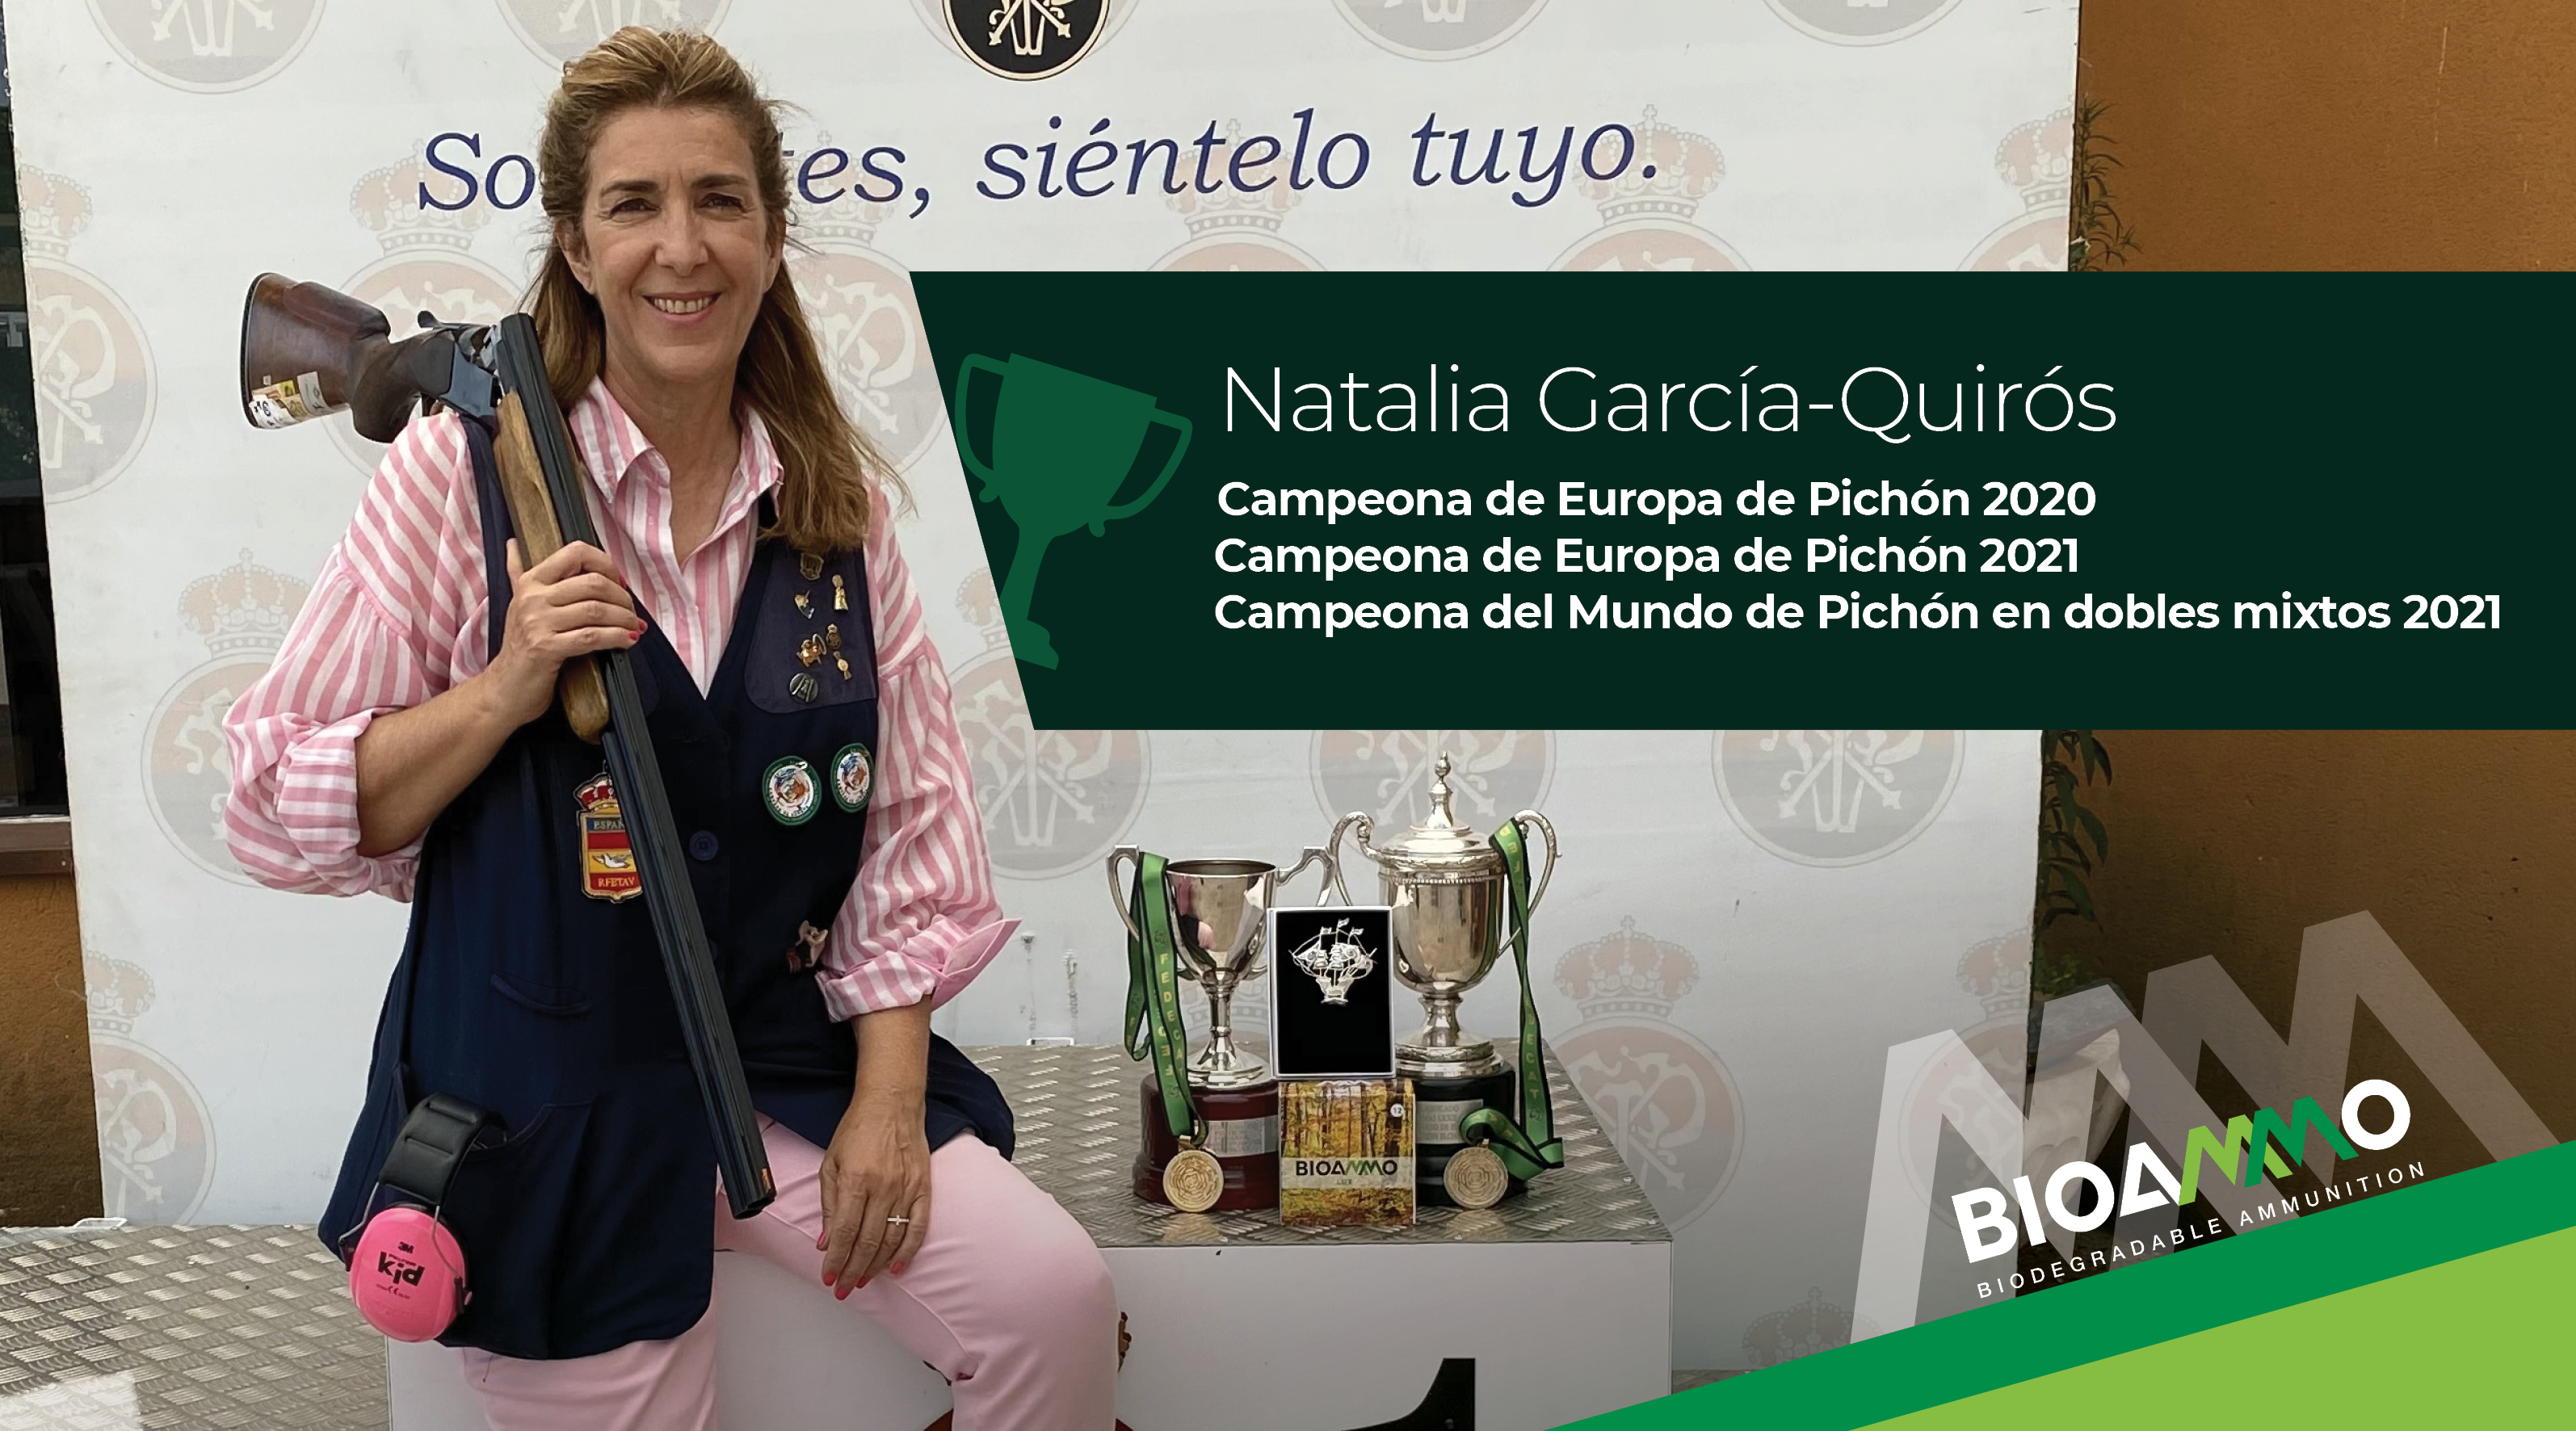 Natalia García-Quirós World Champion with Bioammo